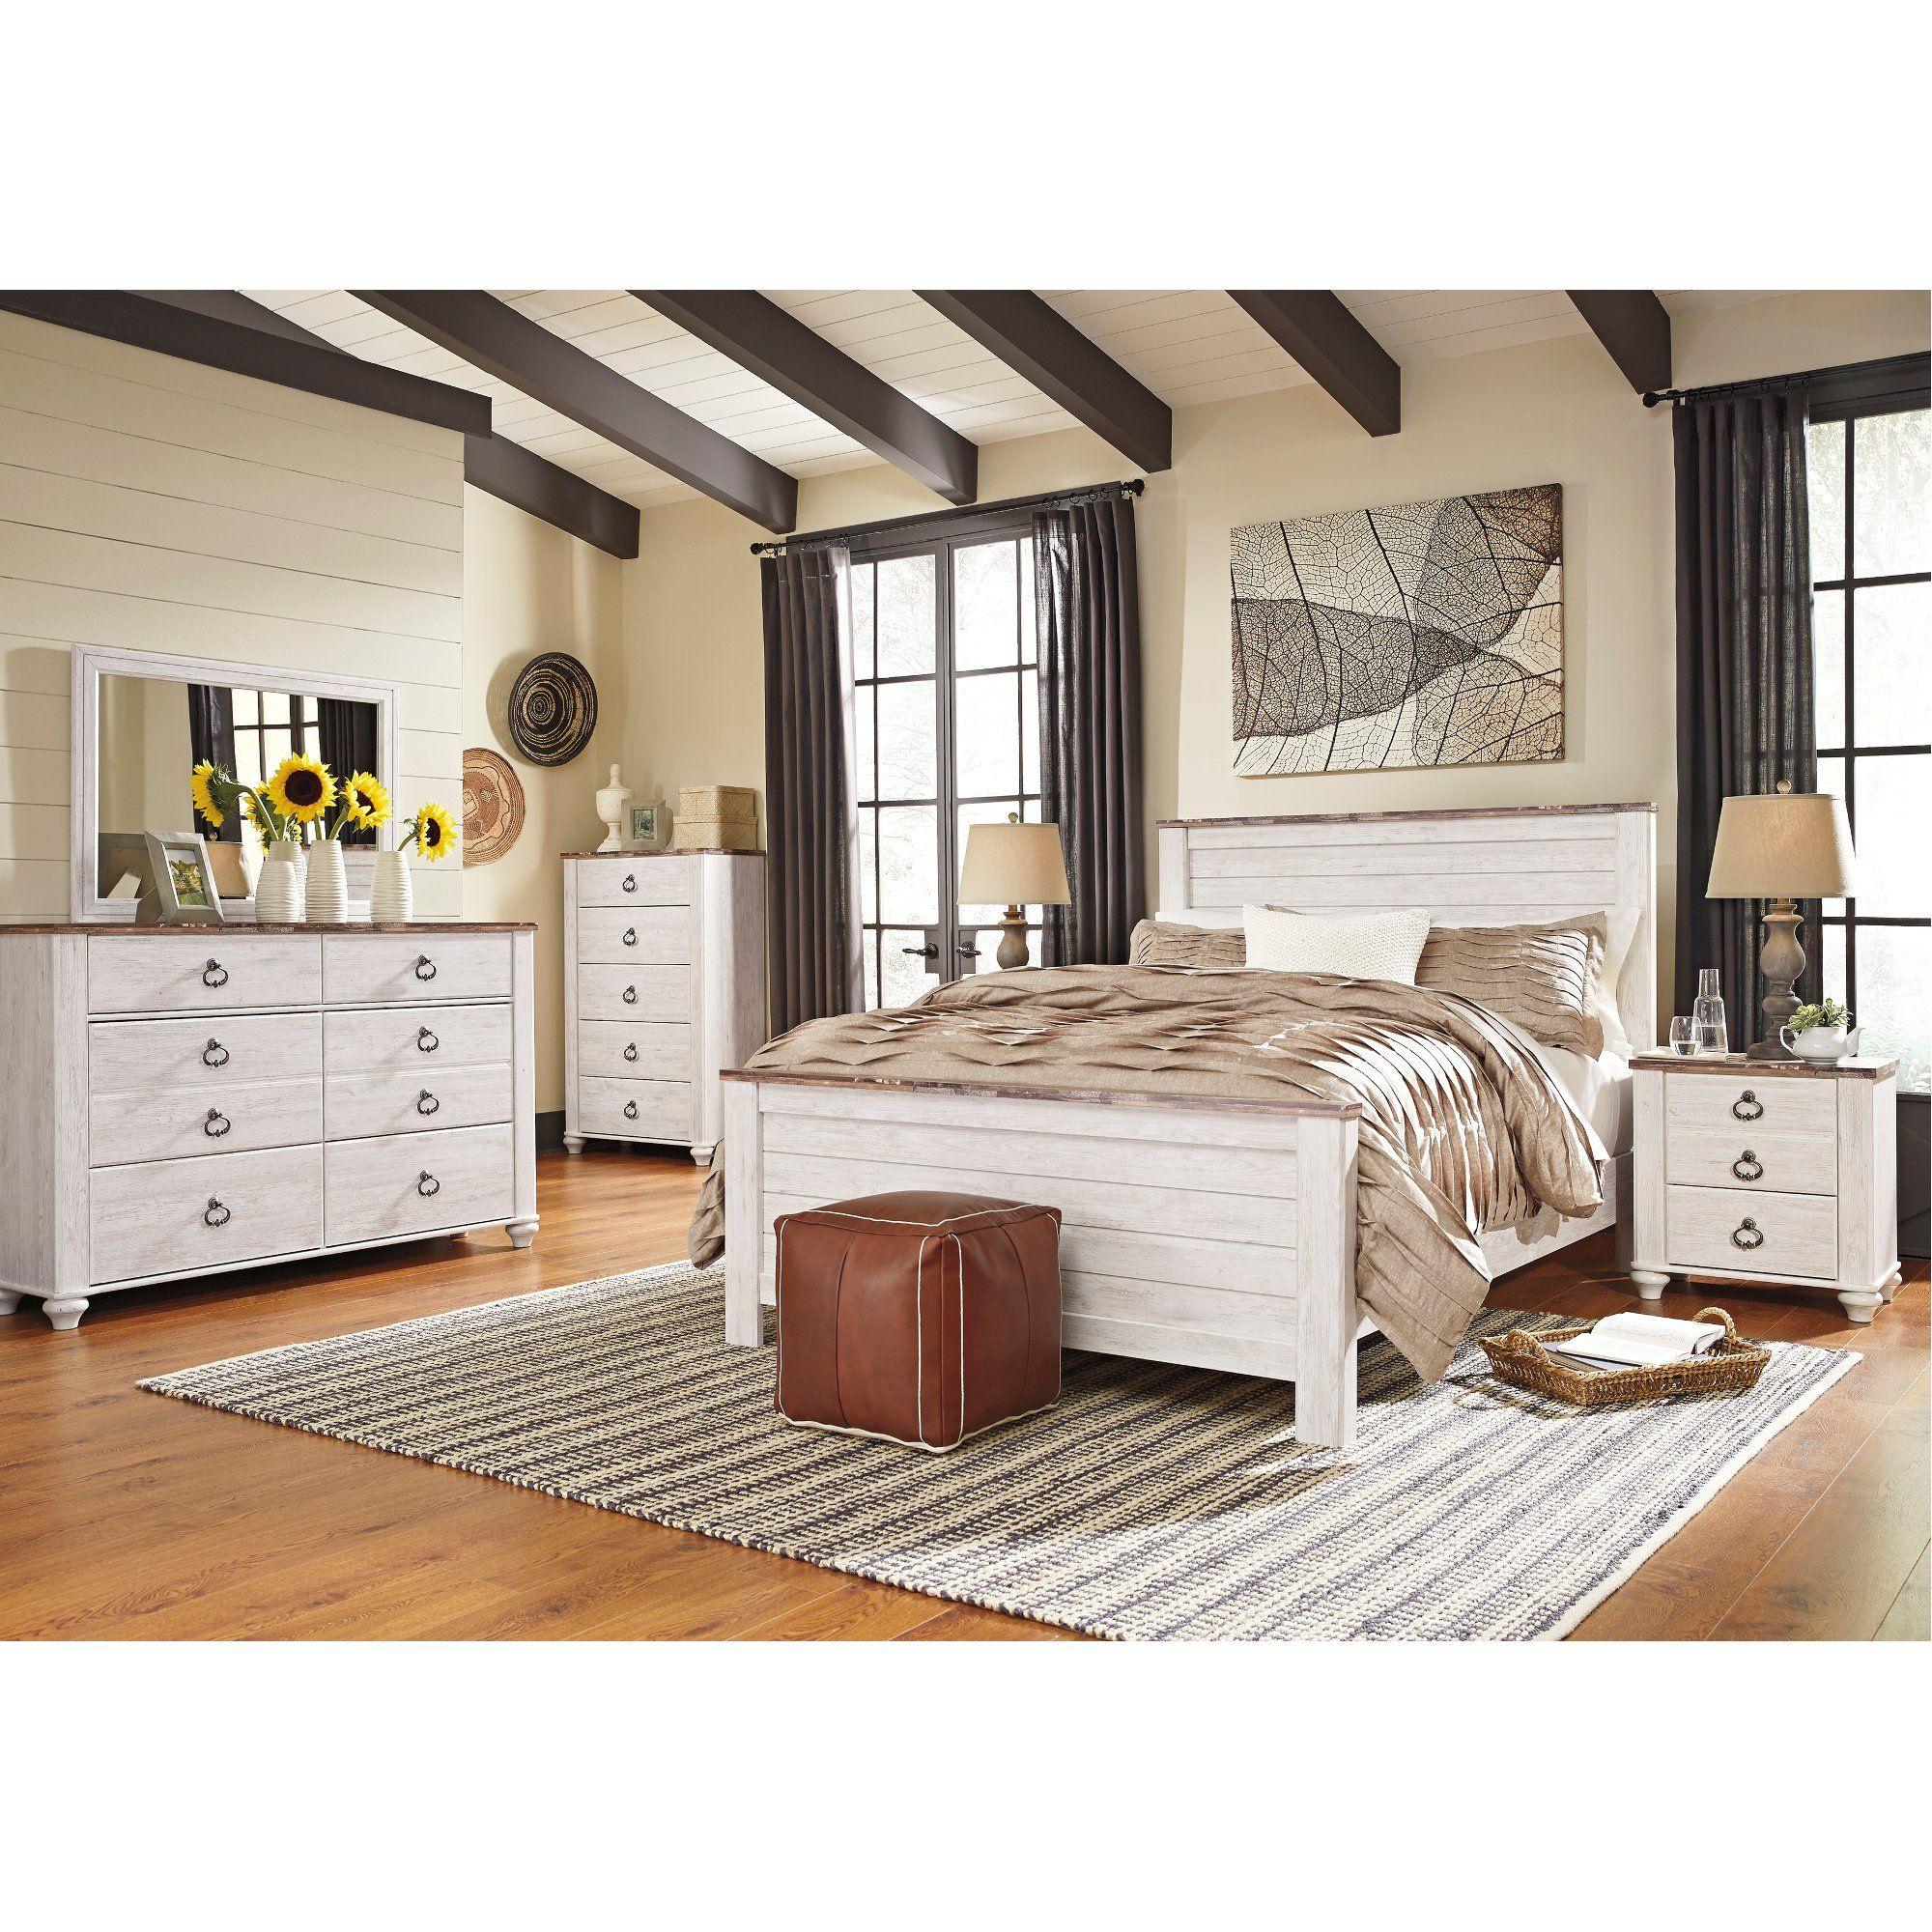 Classic Rustic Whitewash 4 Piece Queen Bedroom Set Millhaven Bedroom Furniture Sets King Bedroom Sets Bedroom Sets